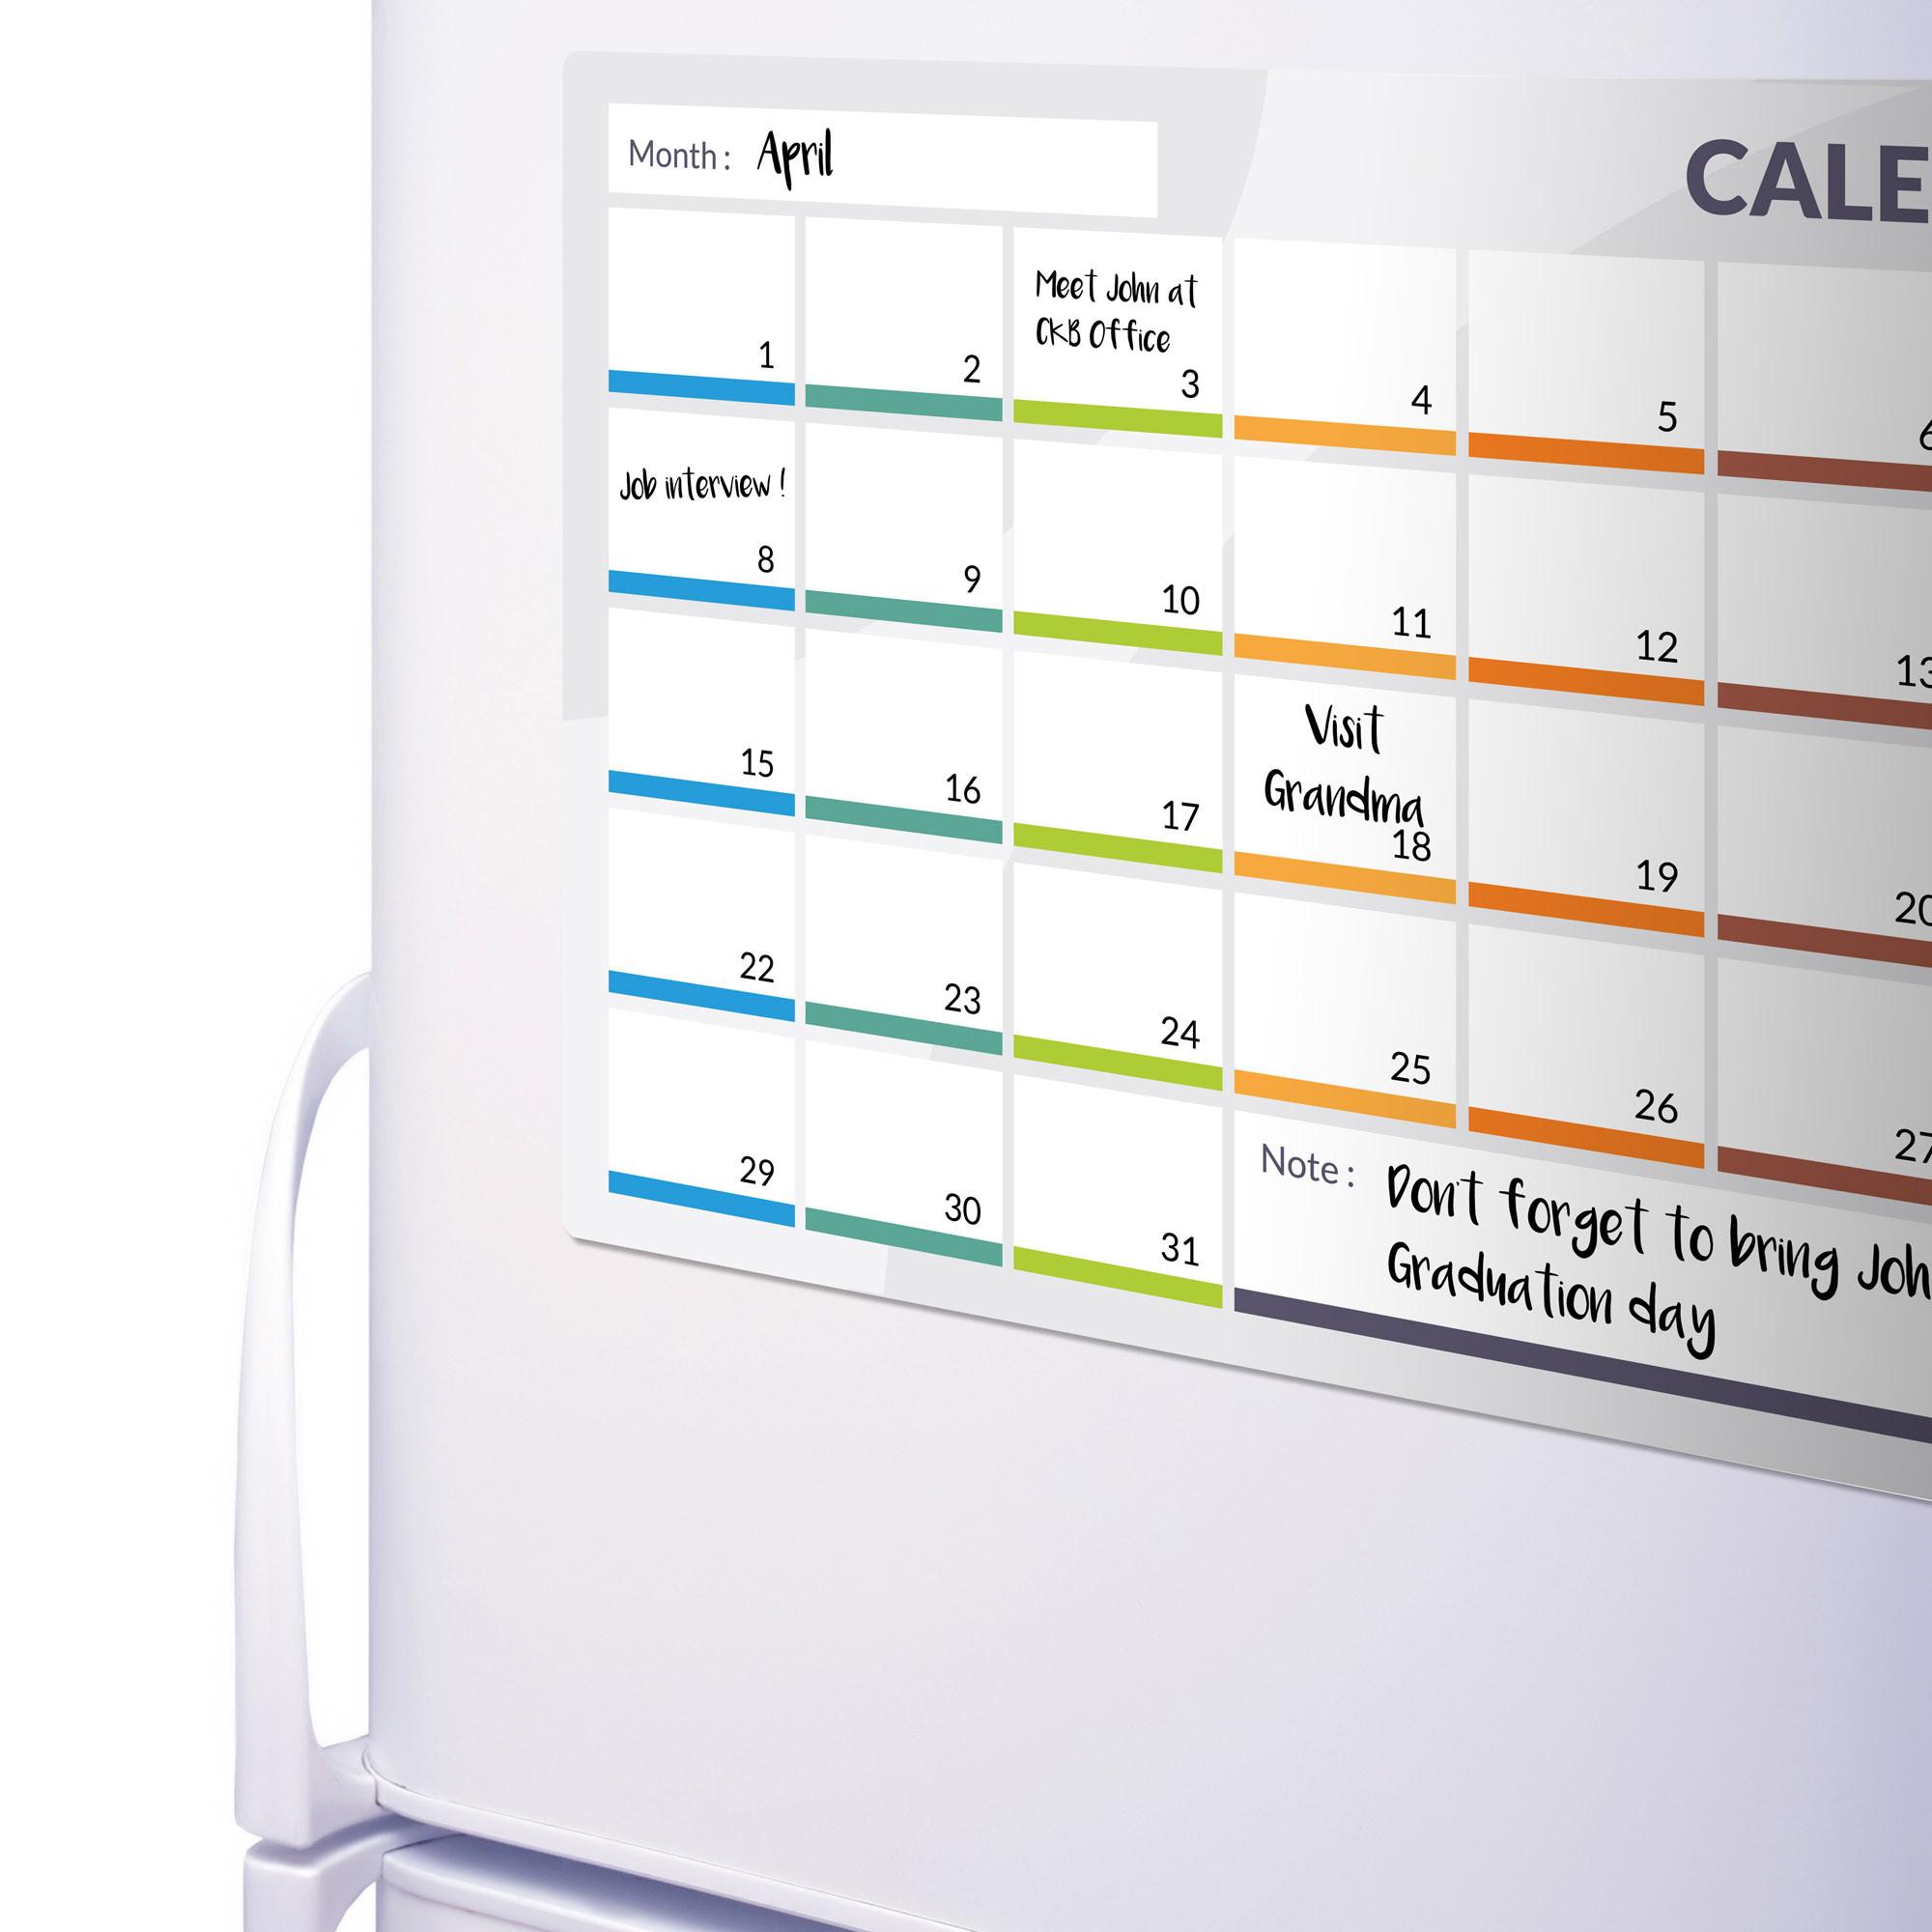 Ckb Ltd Calendar Magnetic Fridge Board | 31 Day Month Planner  31 Day Monthly Schedule